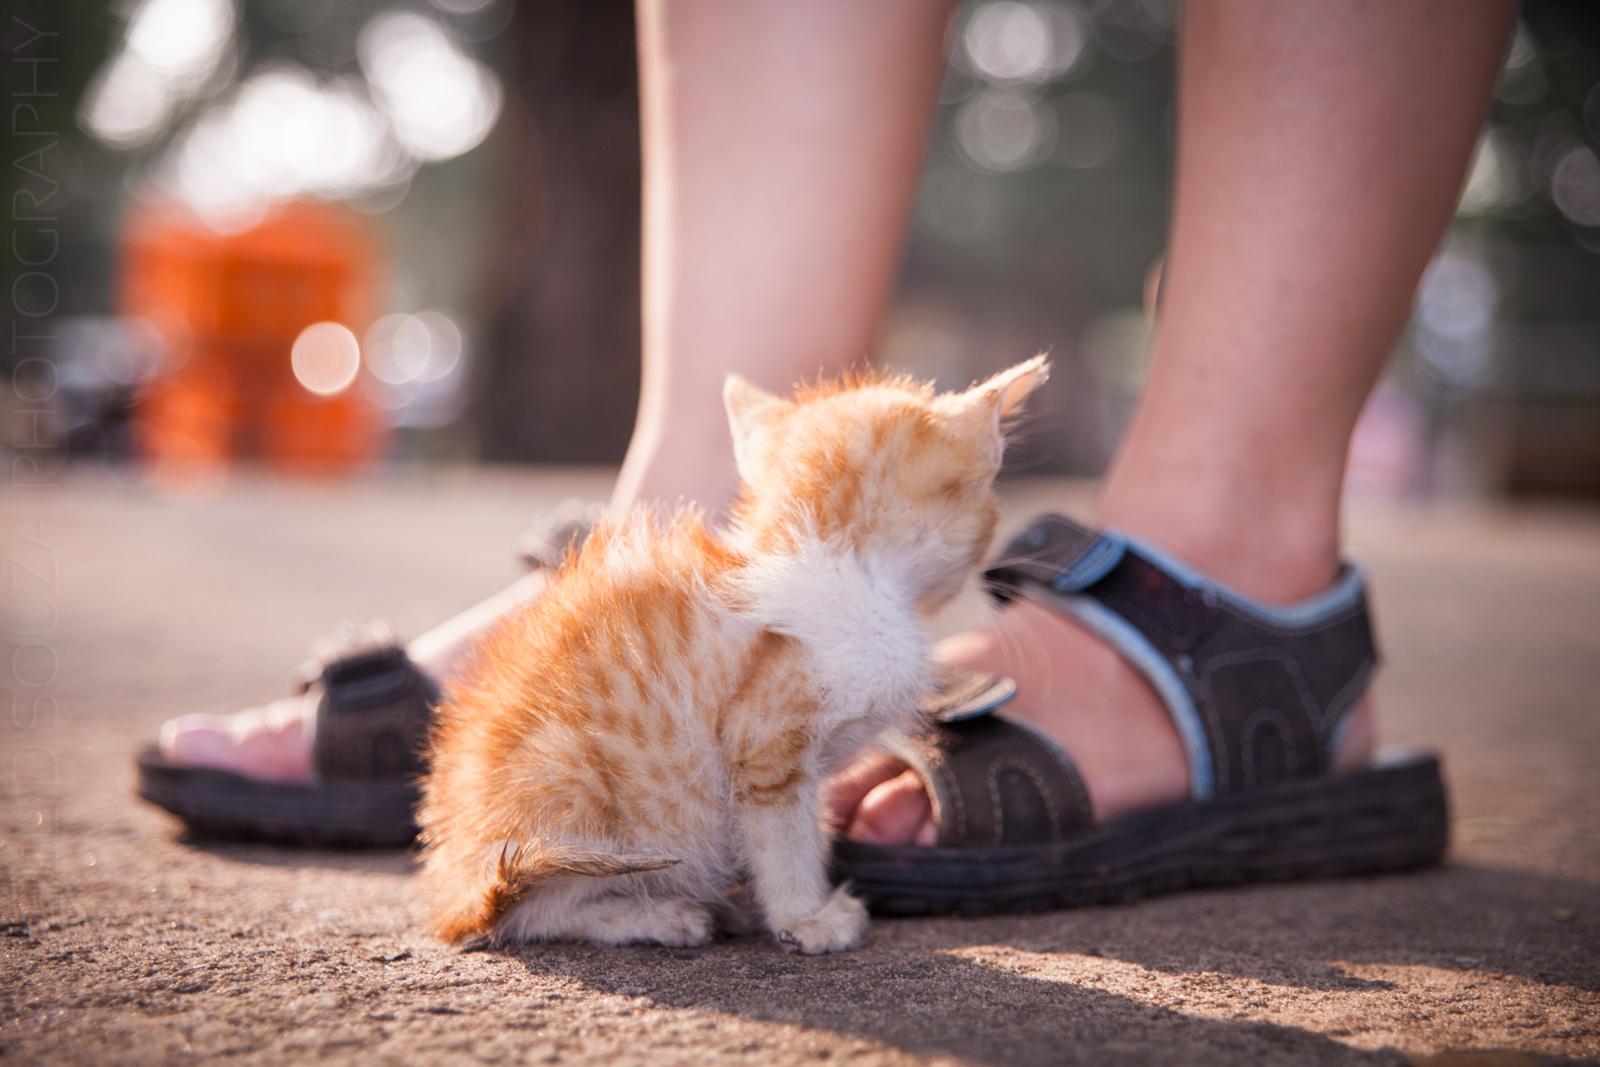 Kitten in the sunlight